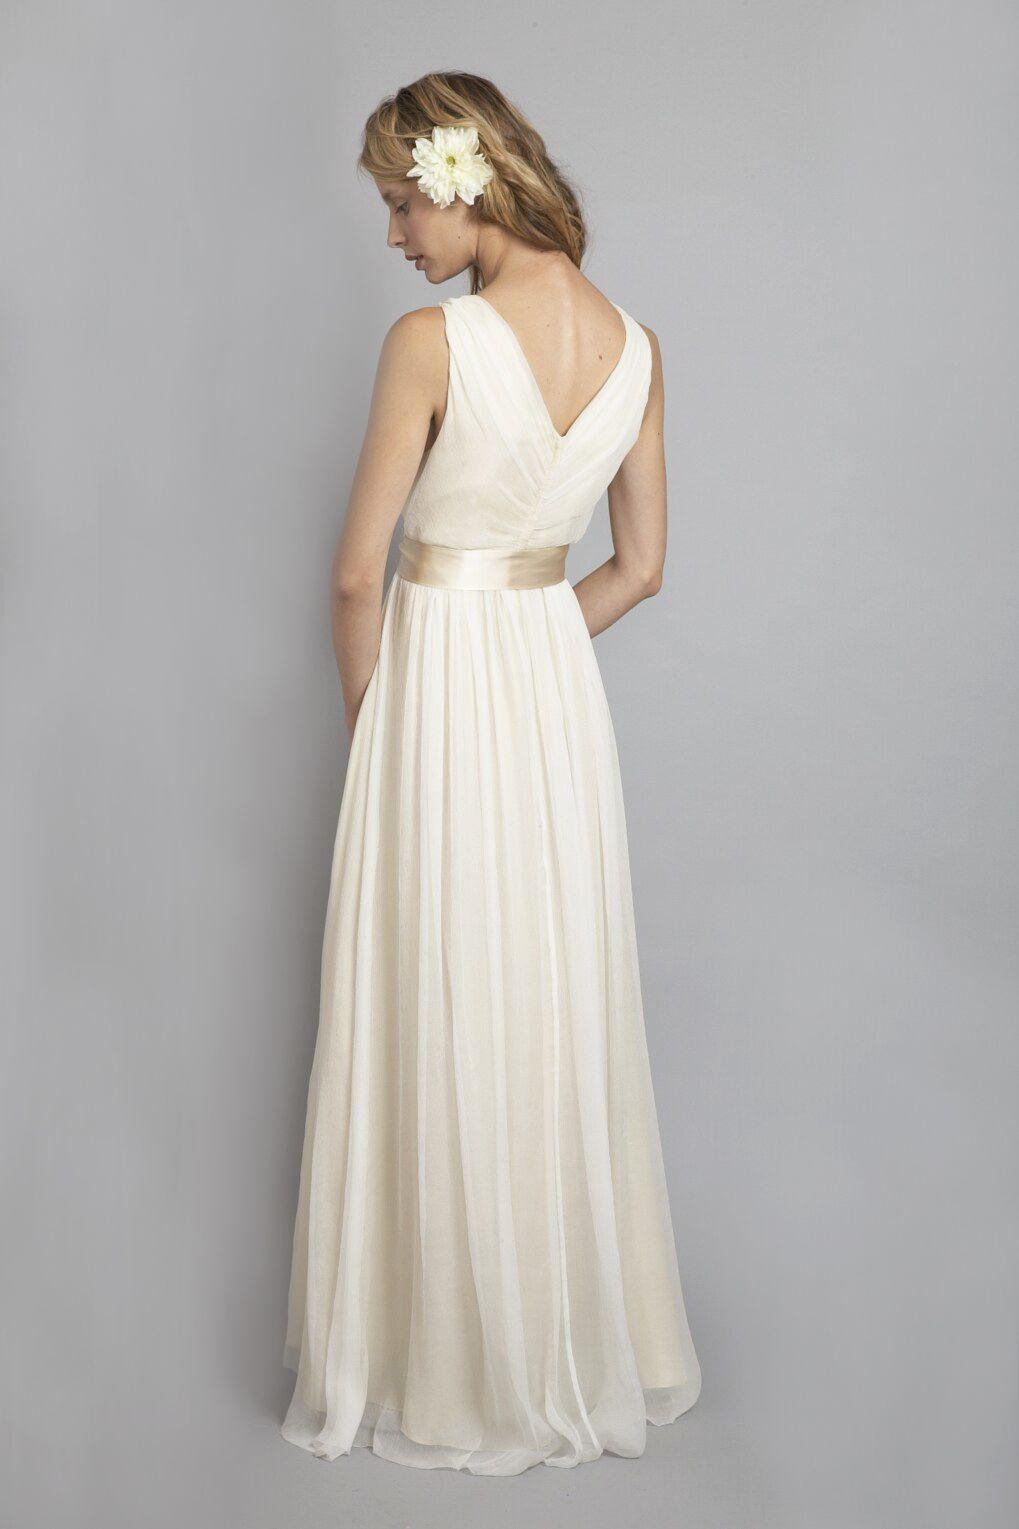 Saja wedding dresses style du sajawedding dress pinterest